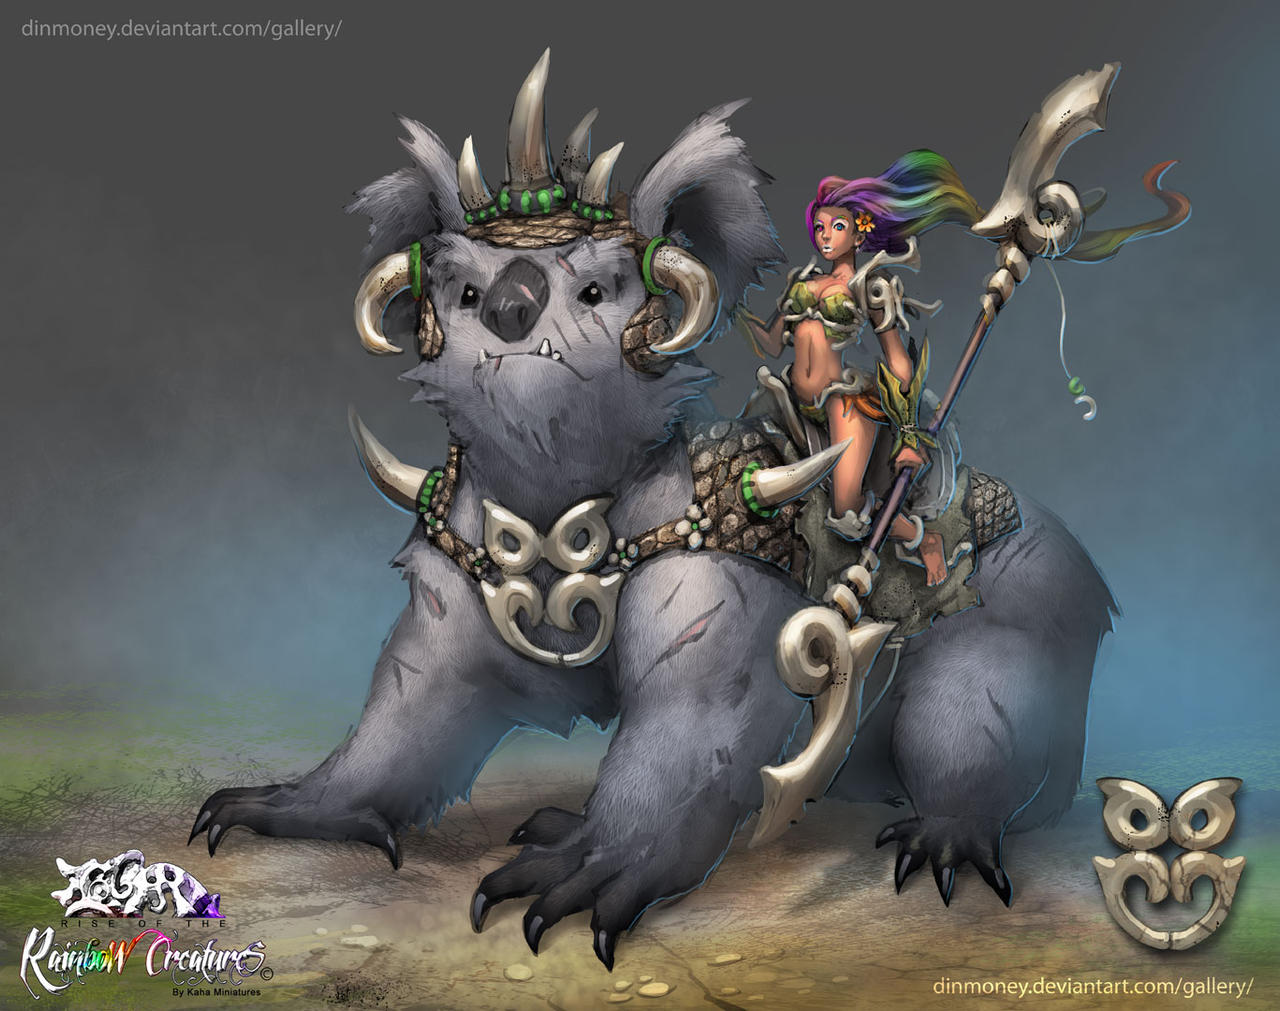 http://fc04.deviantart.net/fs71/i/2011/329/c/e/rotrc___woonona_riding_dharuk_gula_by_dinmoney-d4h83d6.jpg